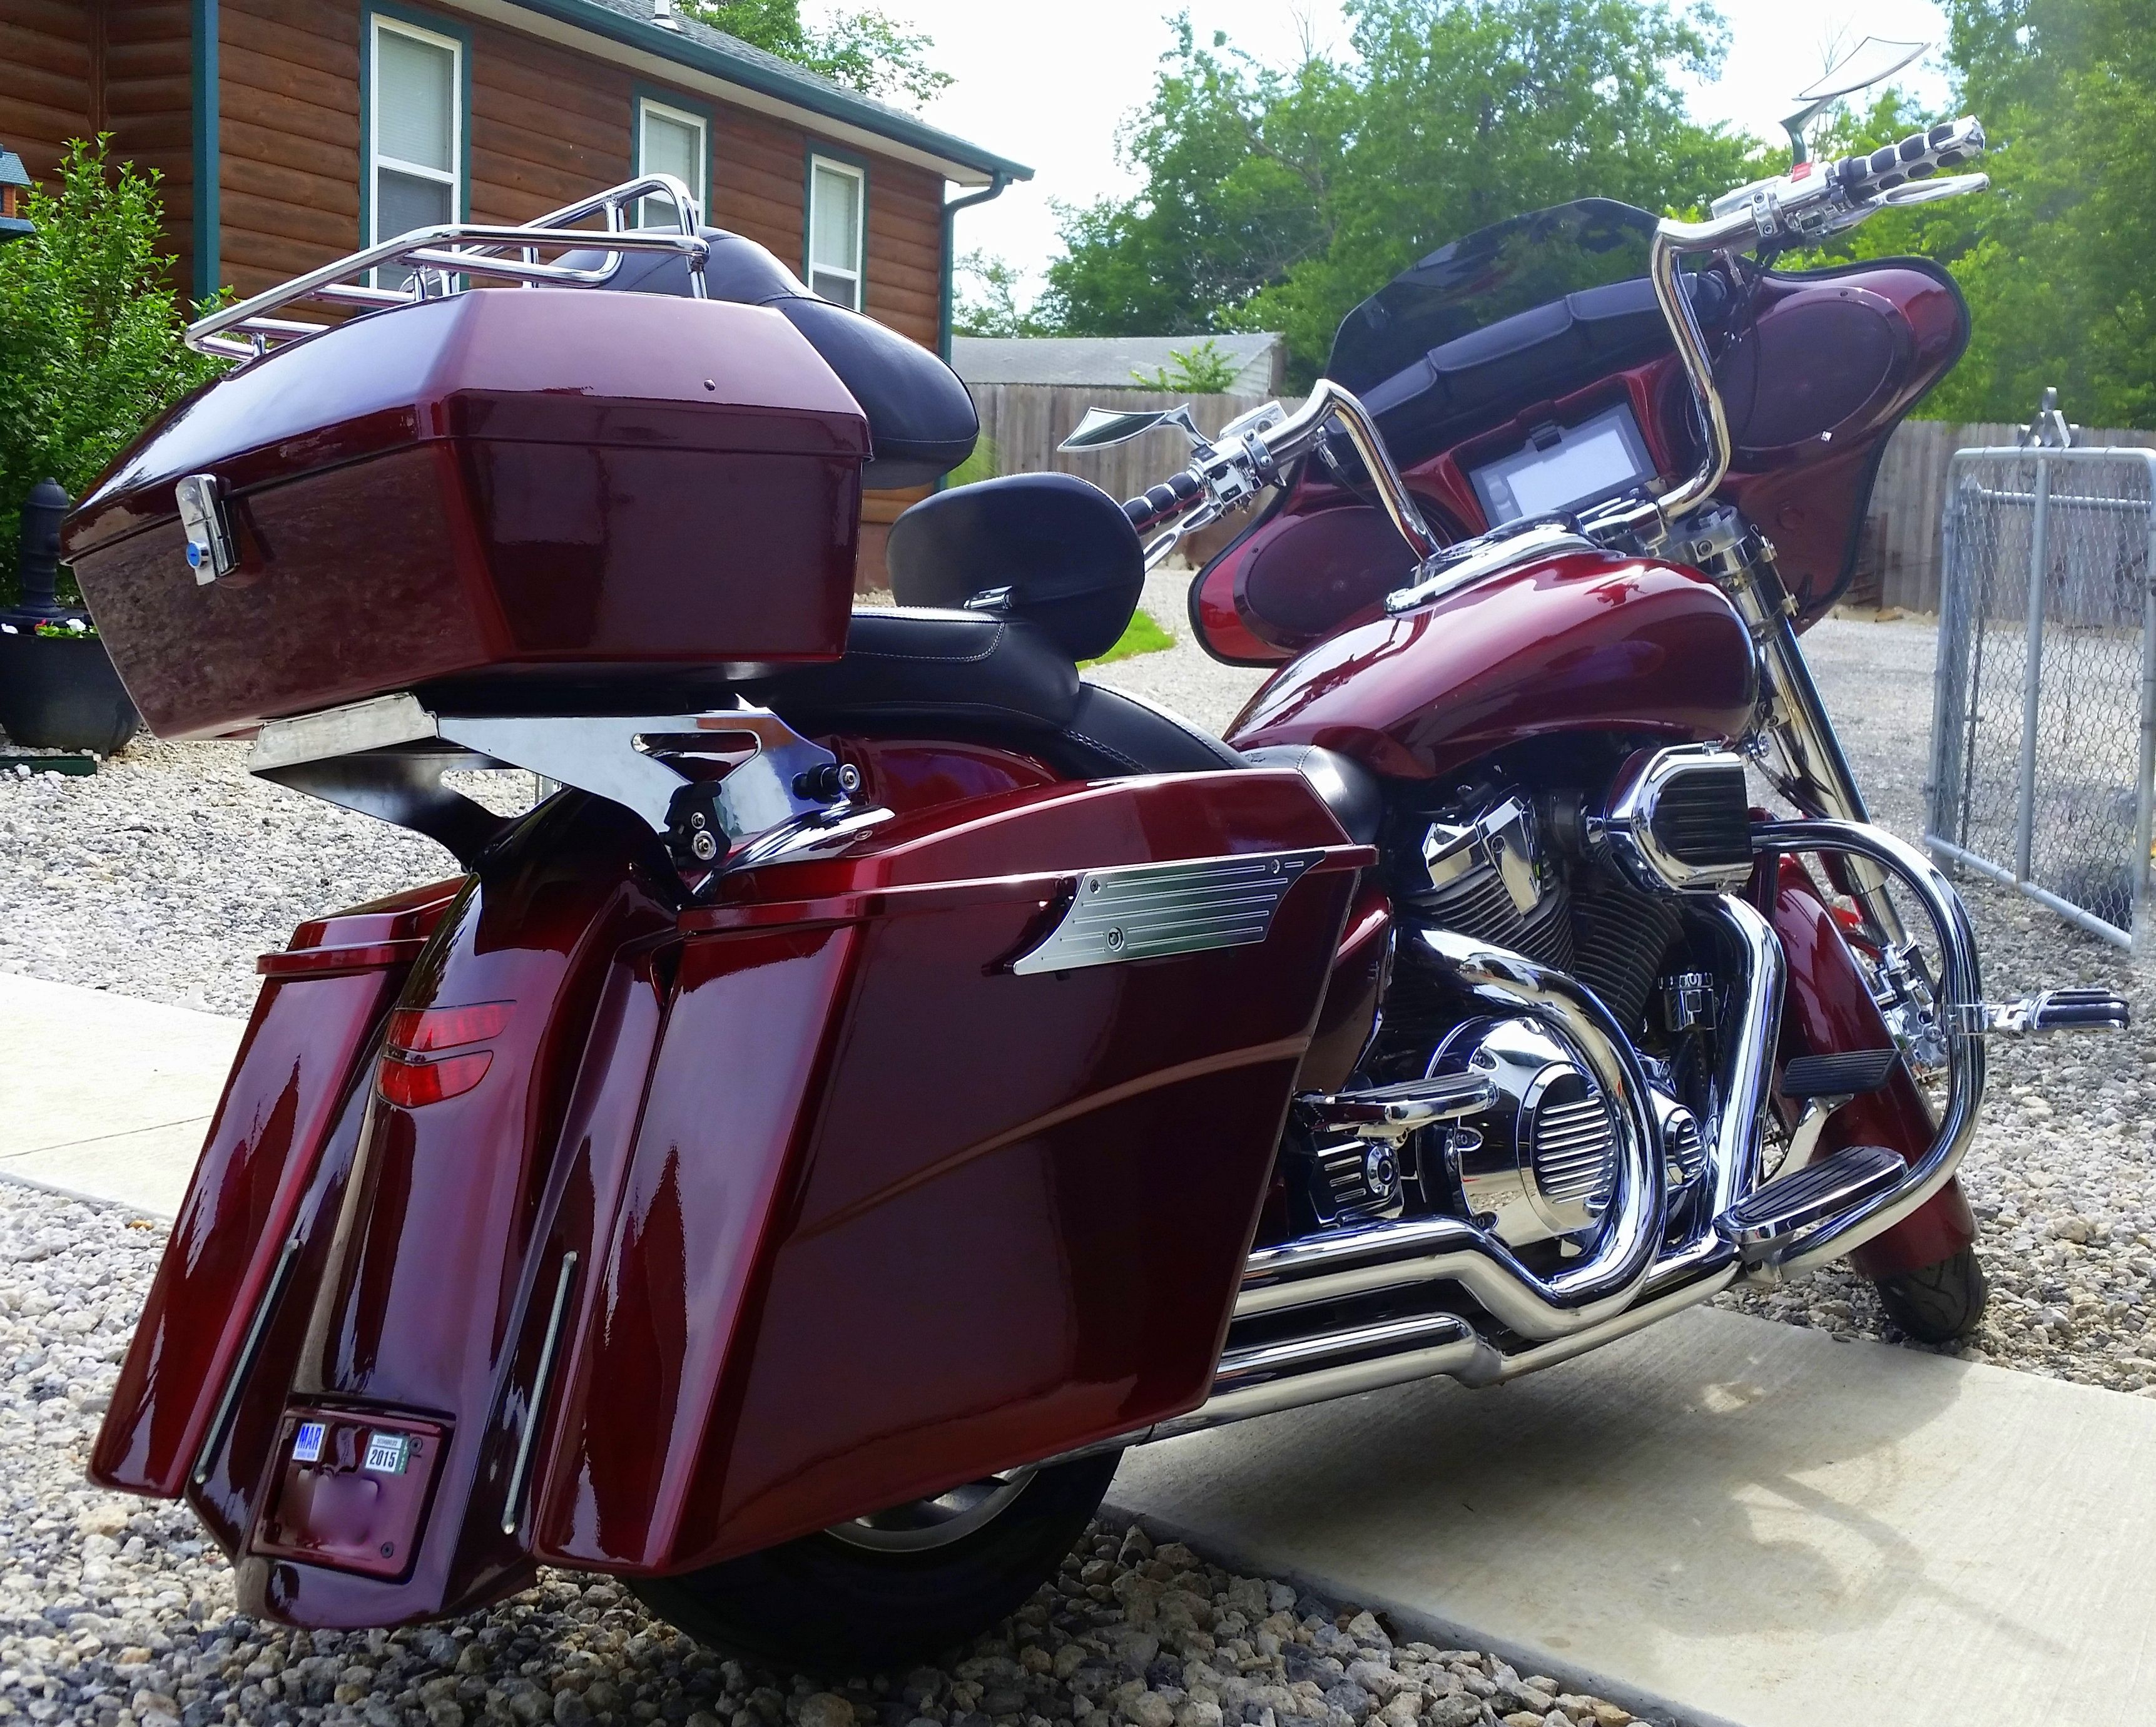 medium resolution of honda 1800 vtx 2004 custom baggers harley davidson cars motorcycles honda dream